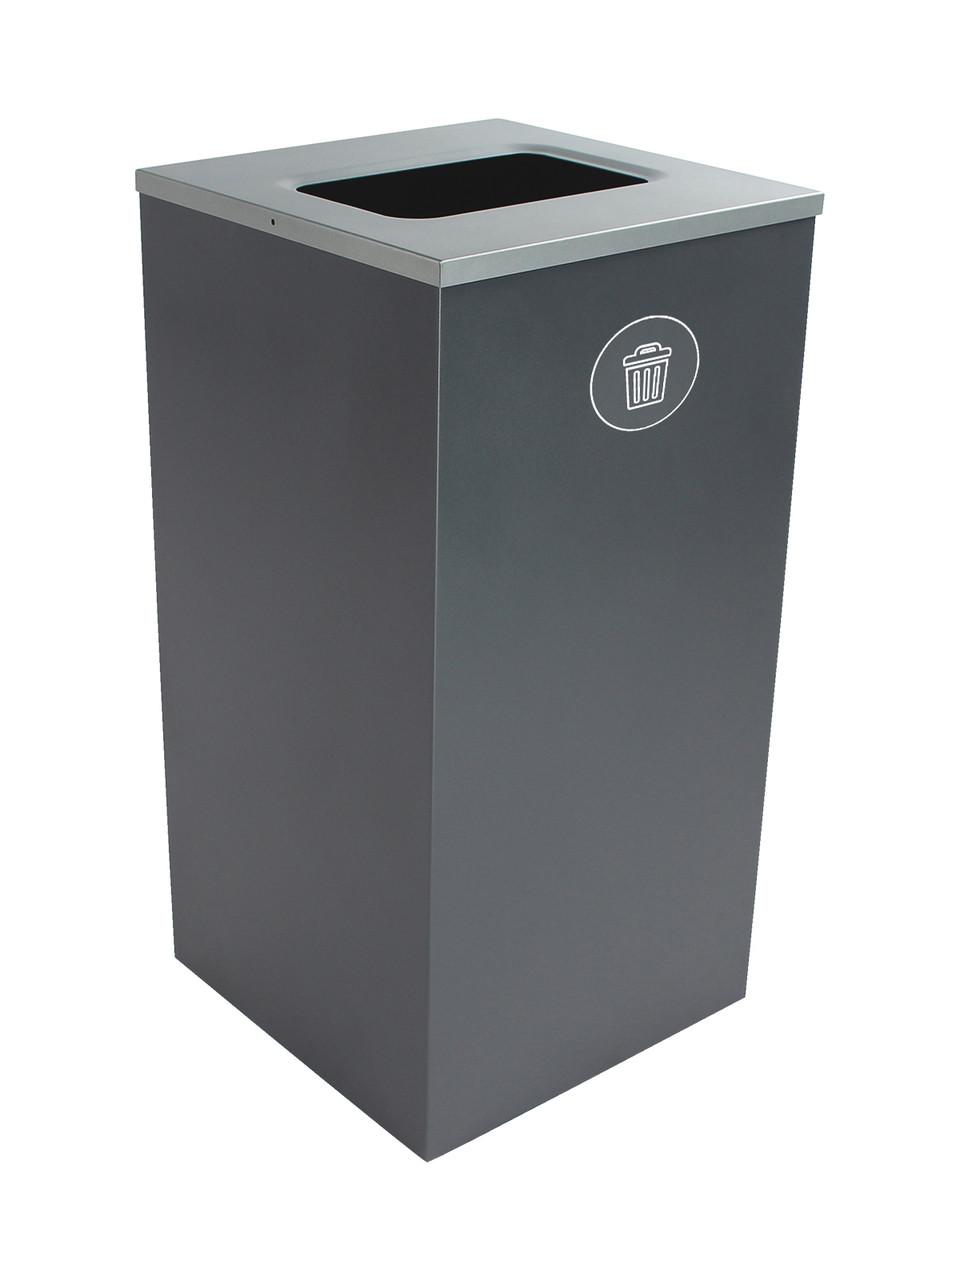 24 Gallon Steel Spectrum Cube Square Waste Can Gray 8107049-4